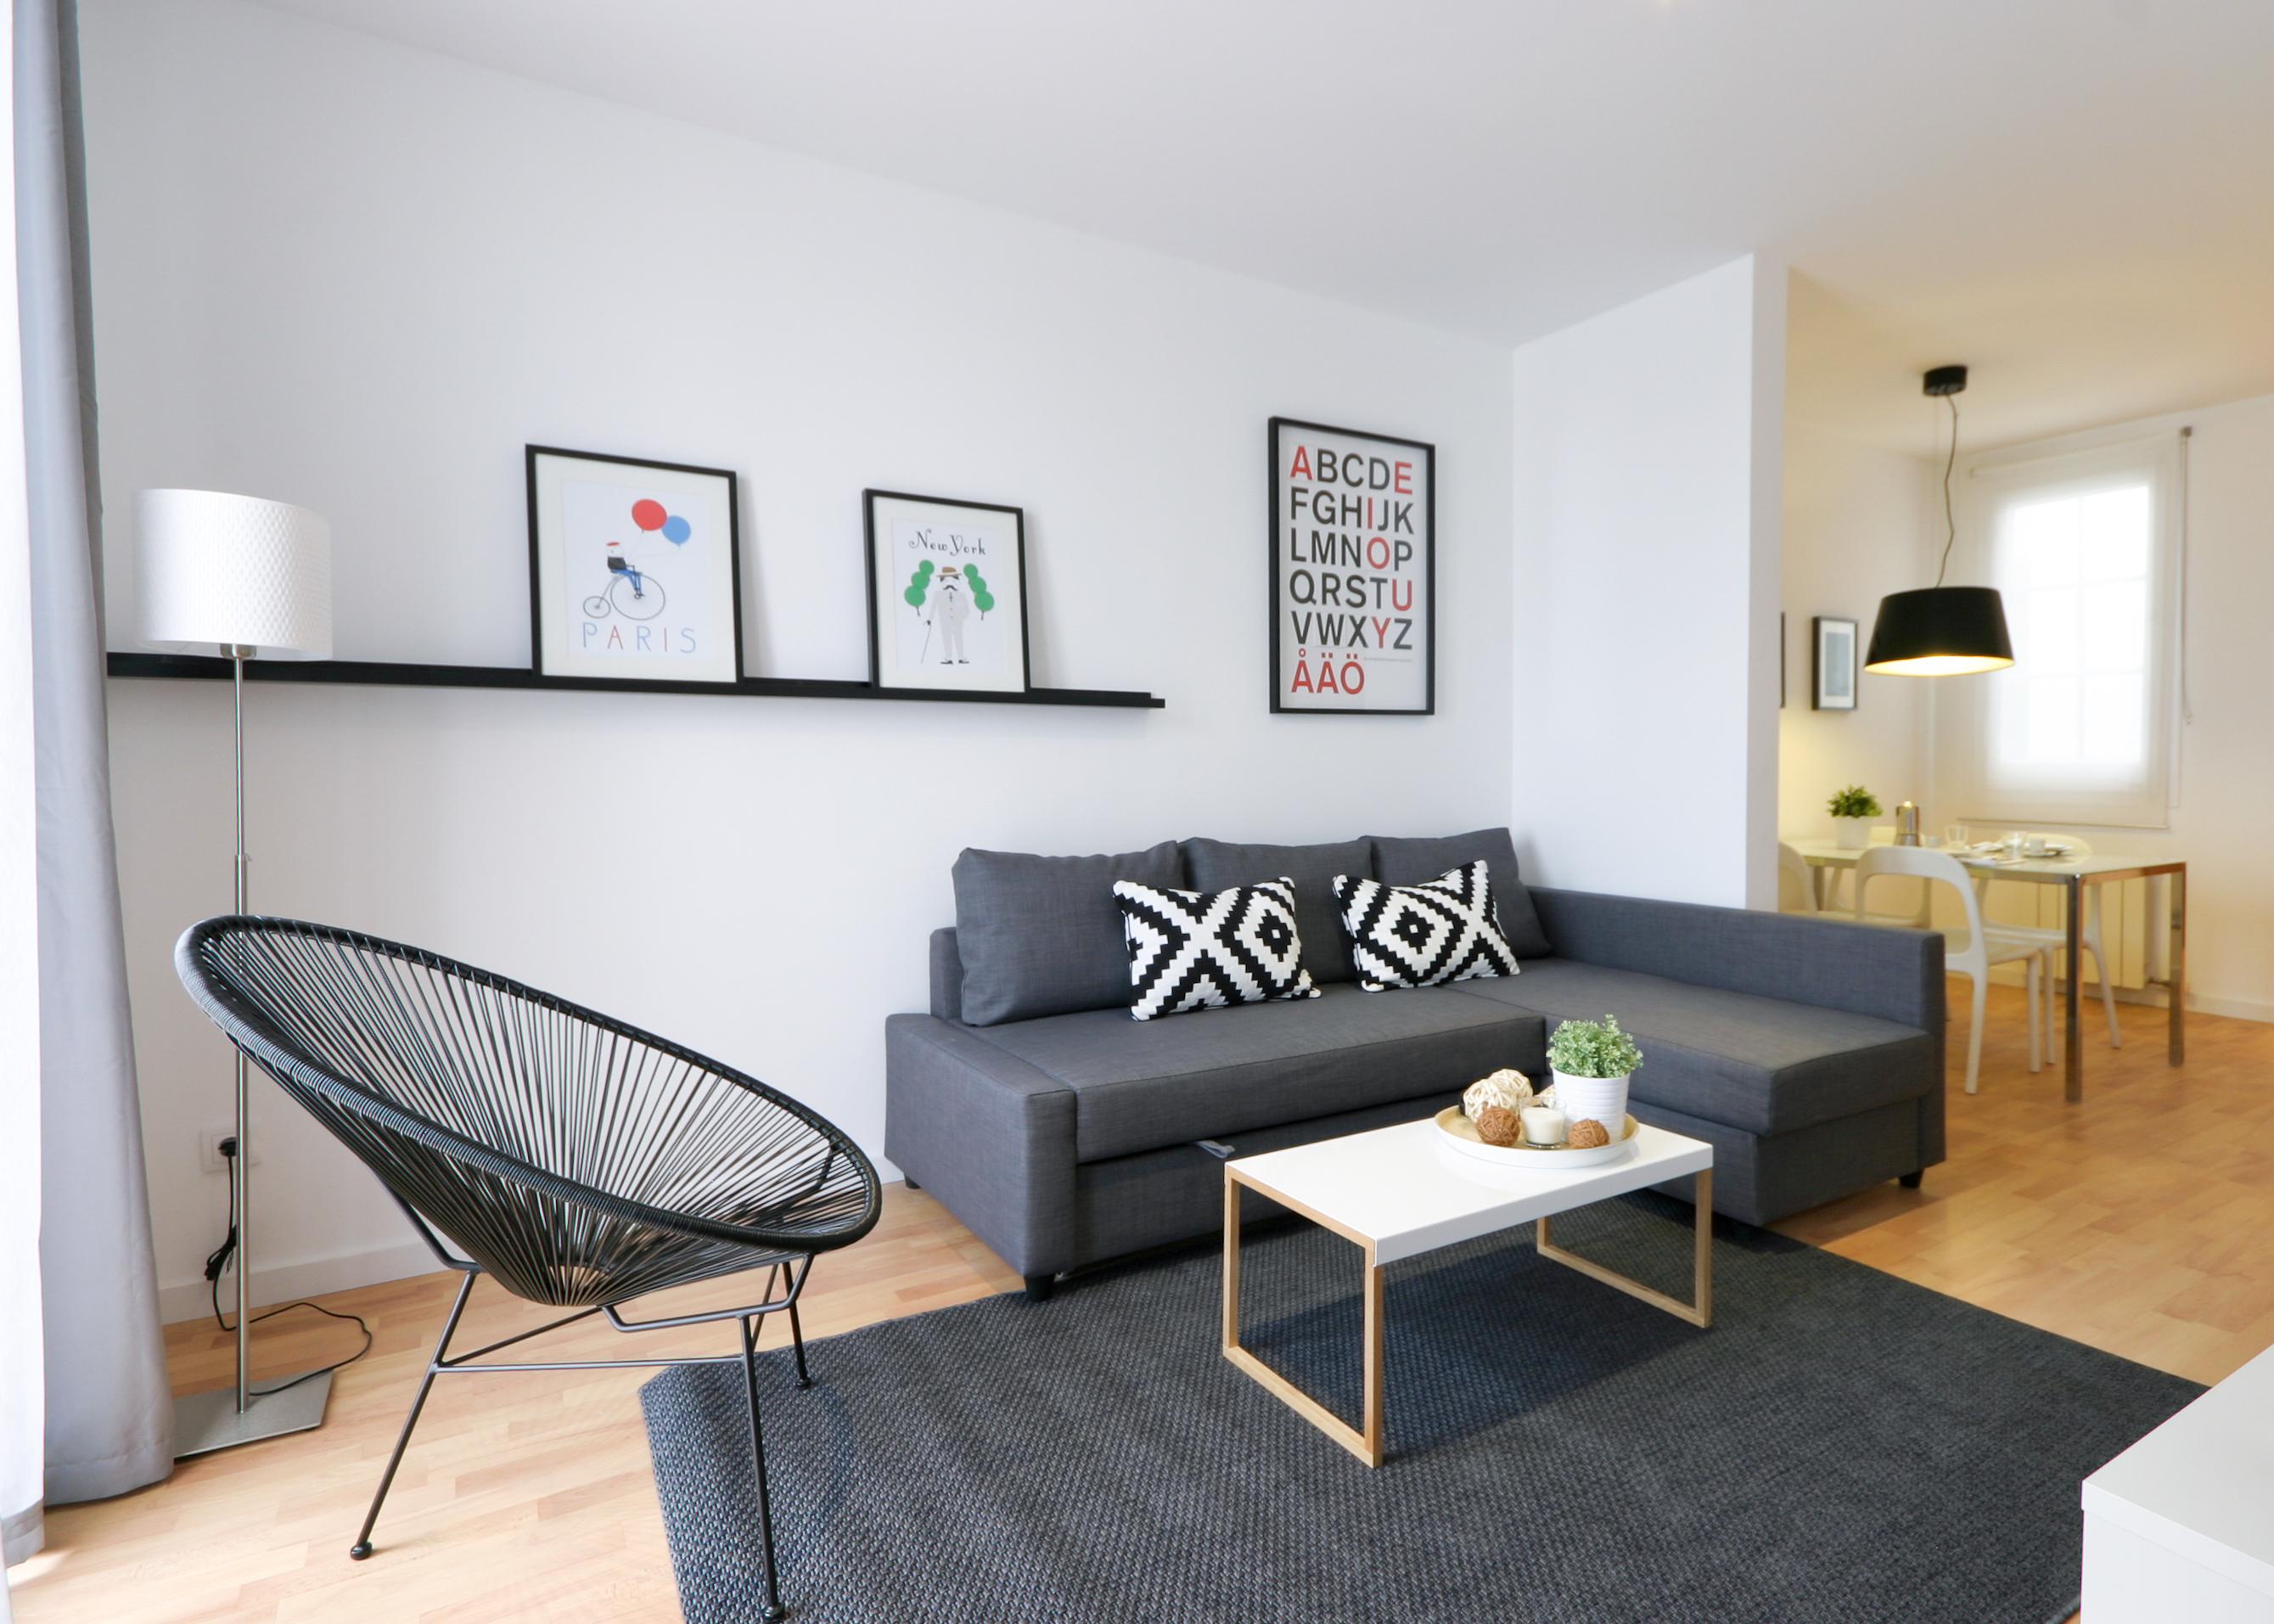 Departamento alquiler con o sin muebles noticias for Alquiler pisos a valenza